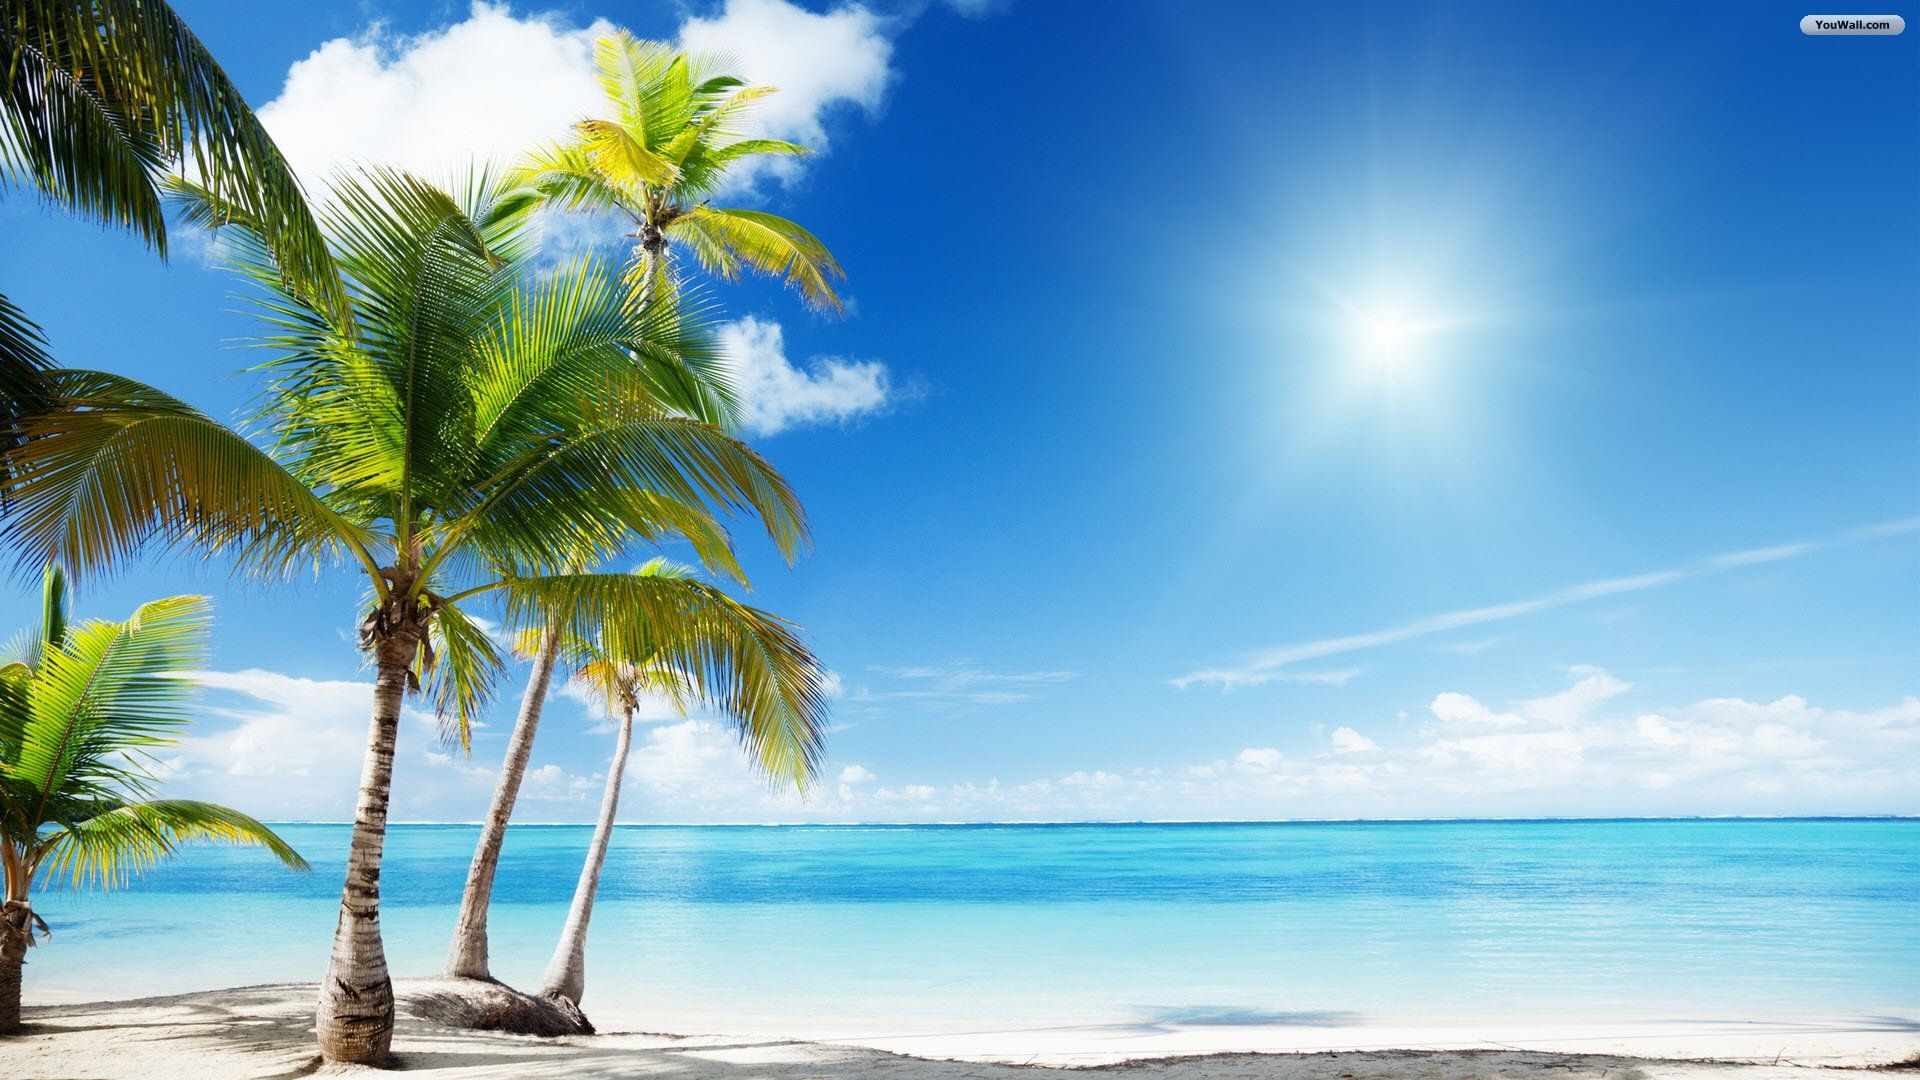 tropical oasis backgrounds google search a· beach wallpaperwallpaper